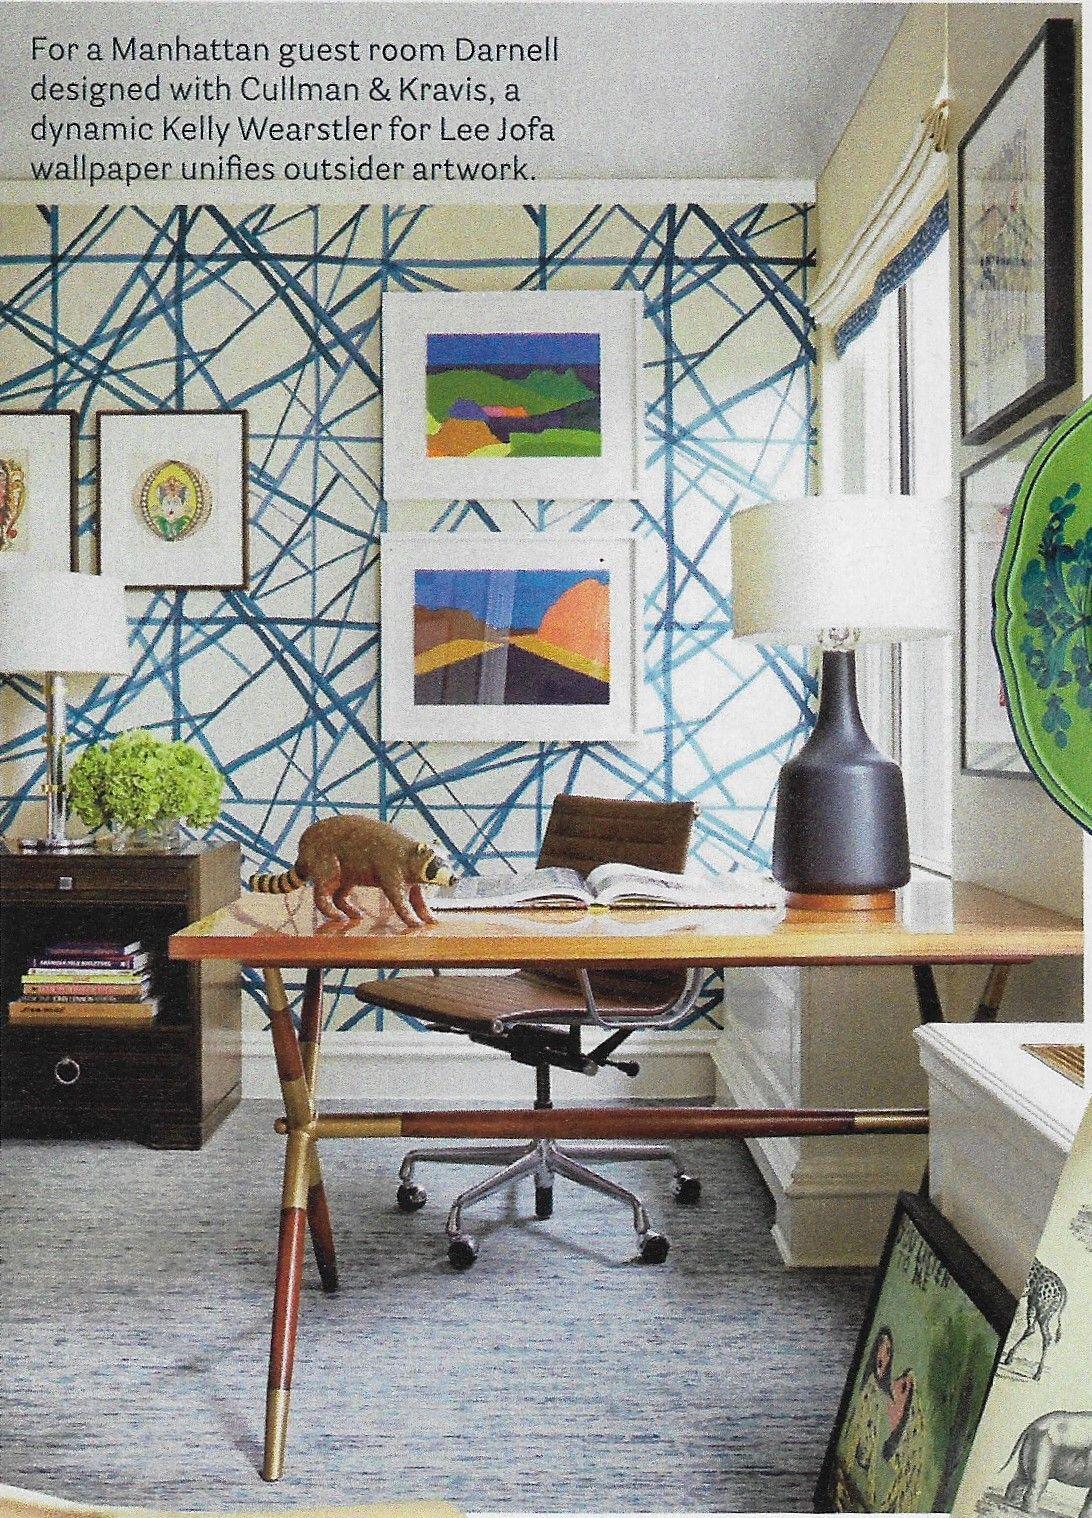 kelly wearstler wallpaper, blue graphic wallpaper, art hung